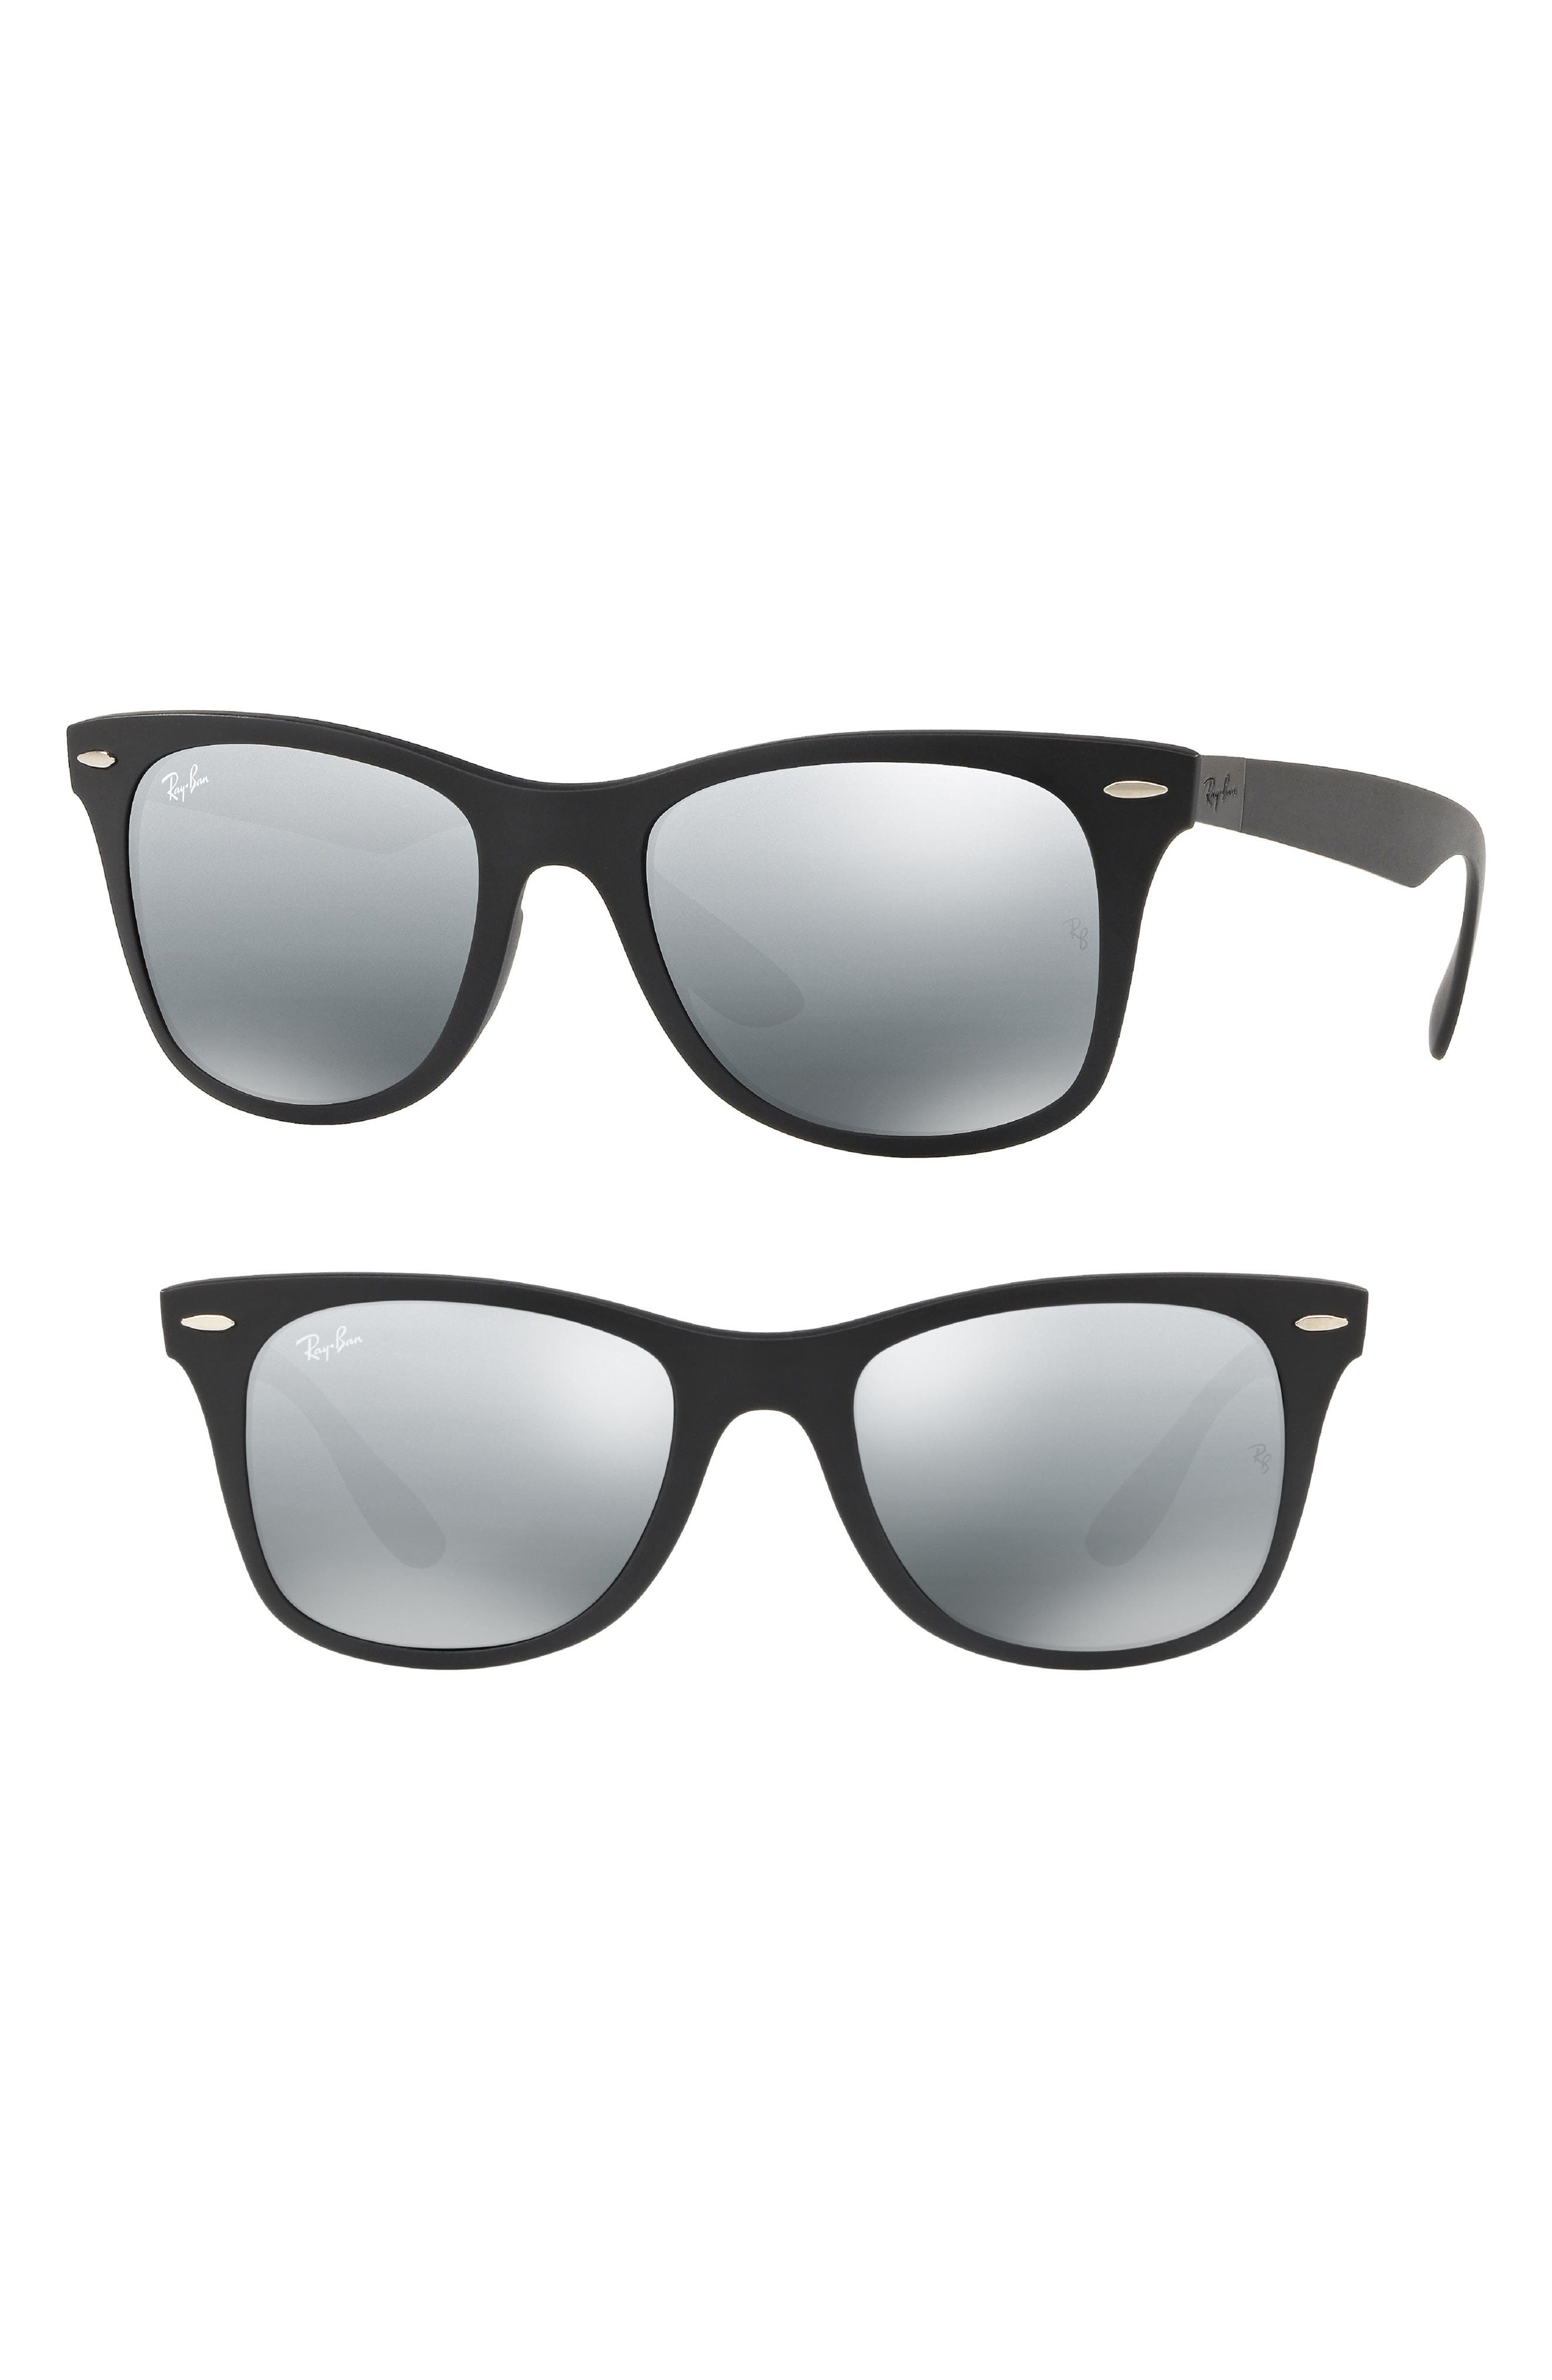 Wayfarer Liteforce 52mm Sunglasses,                         Main,                         color, 013